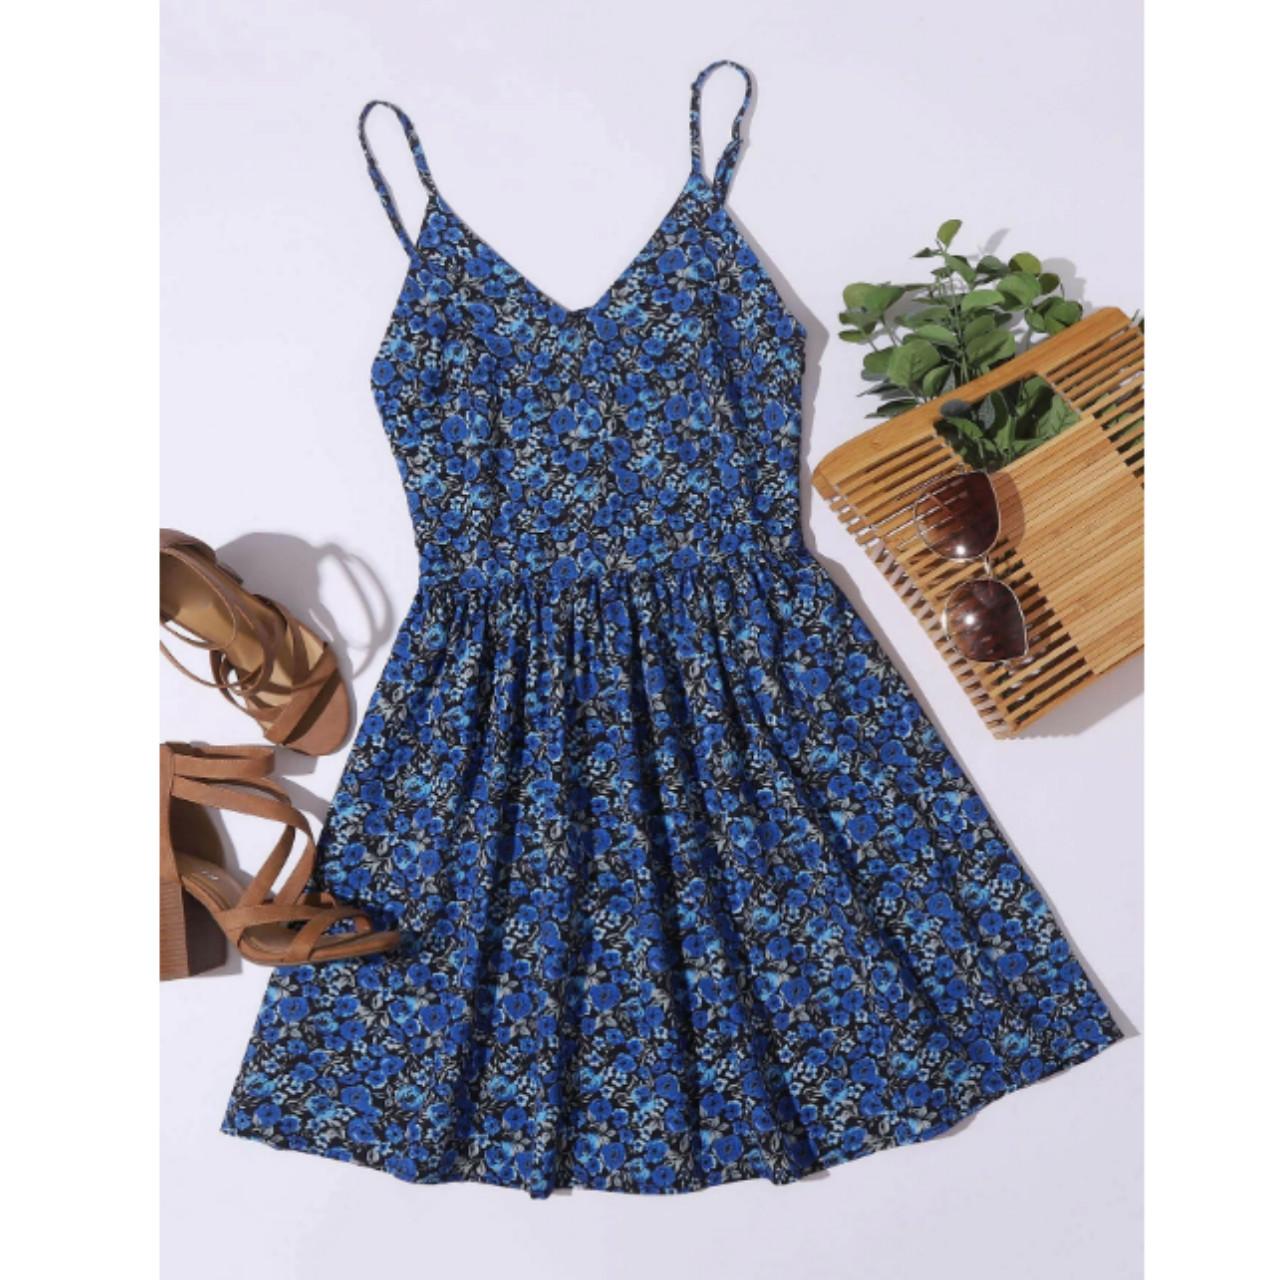 Allover floral cami dress m